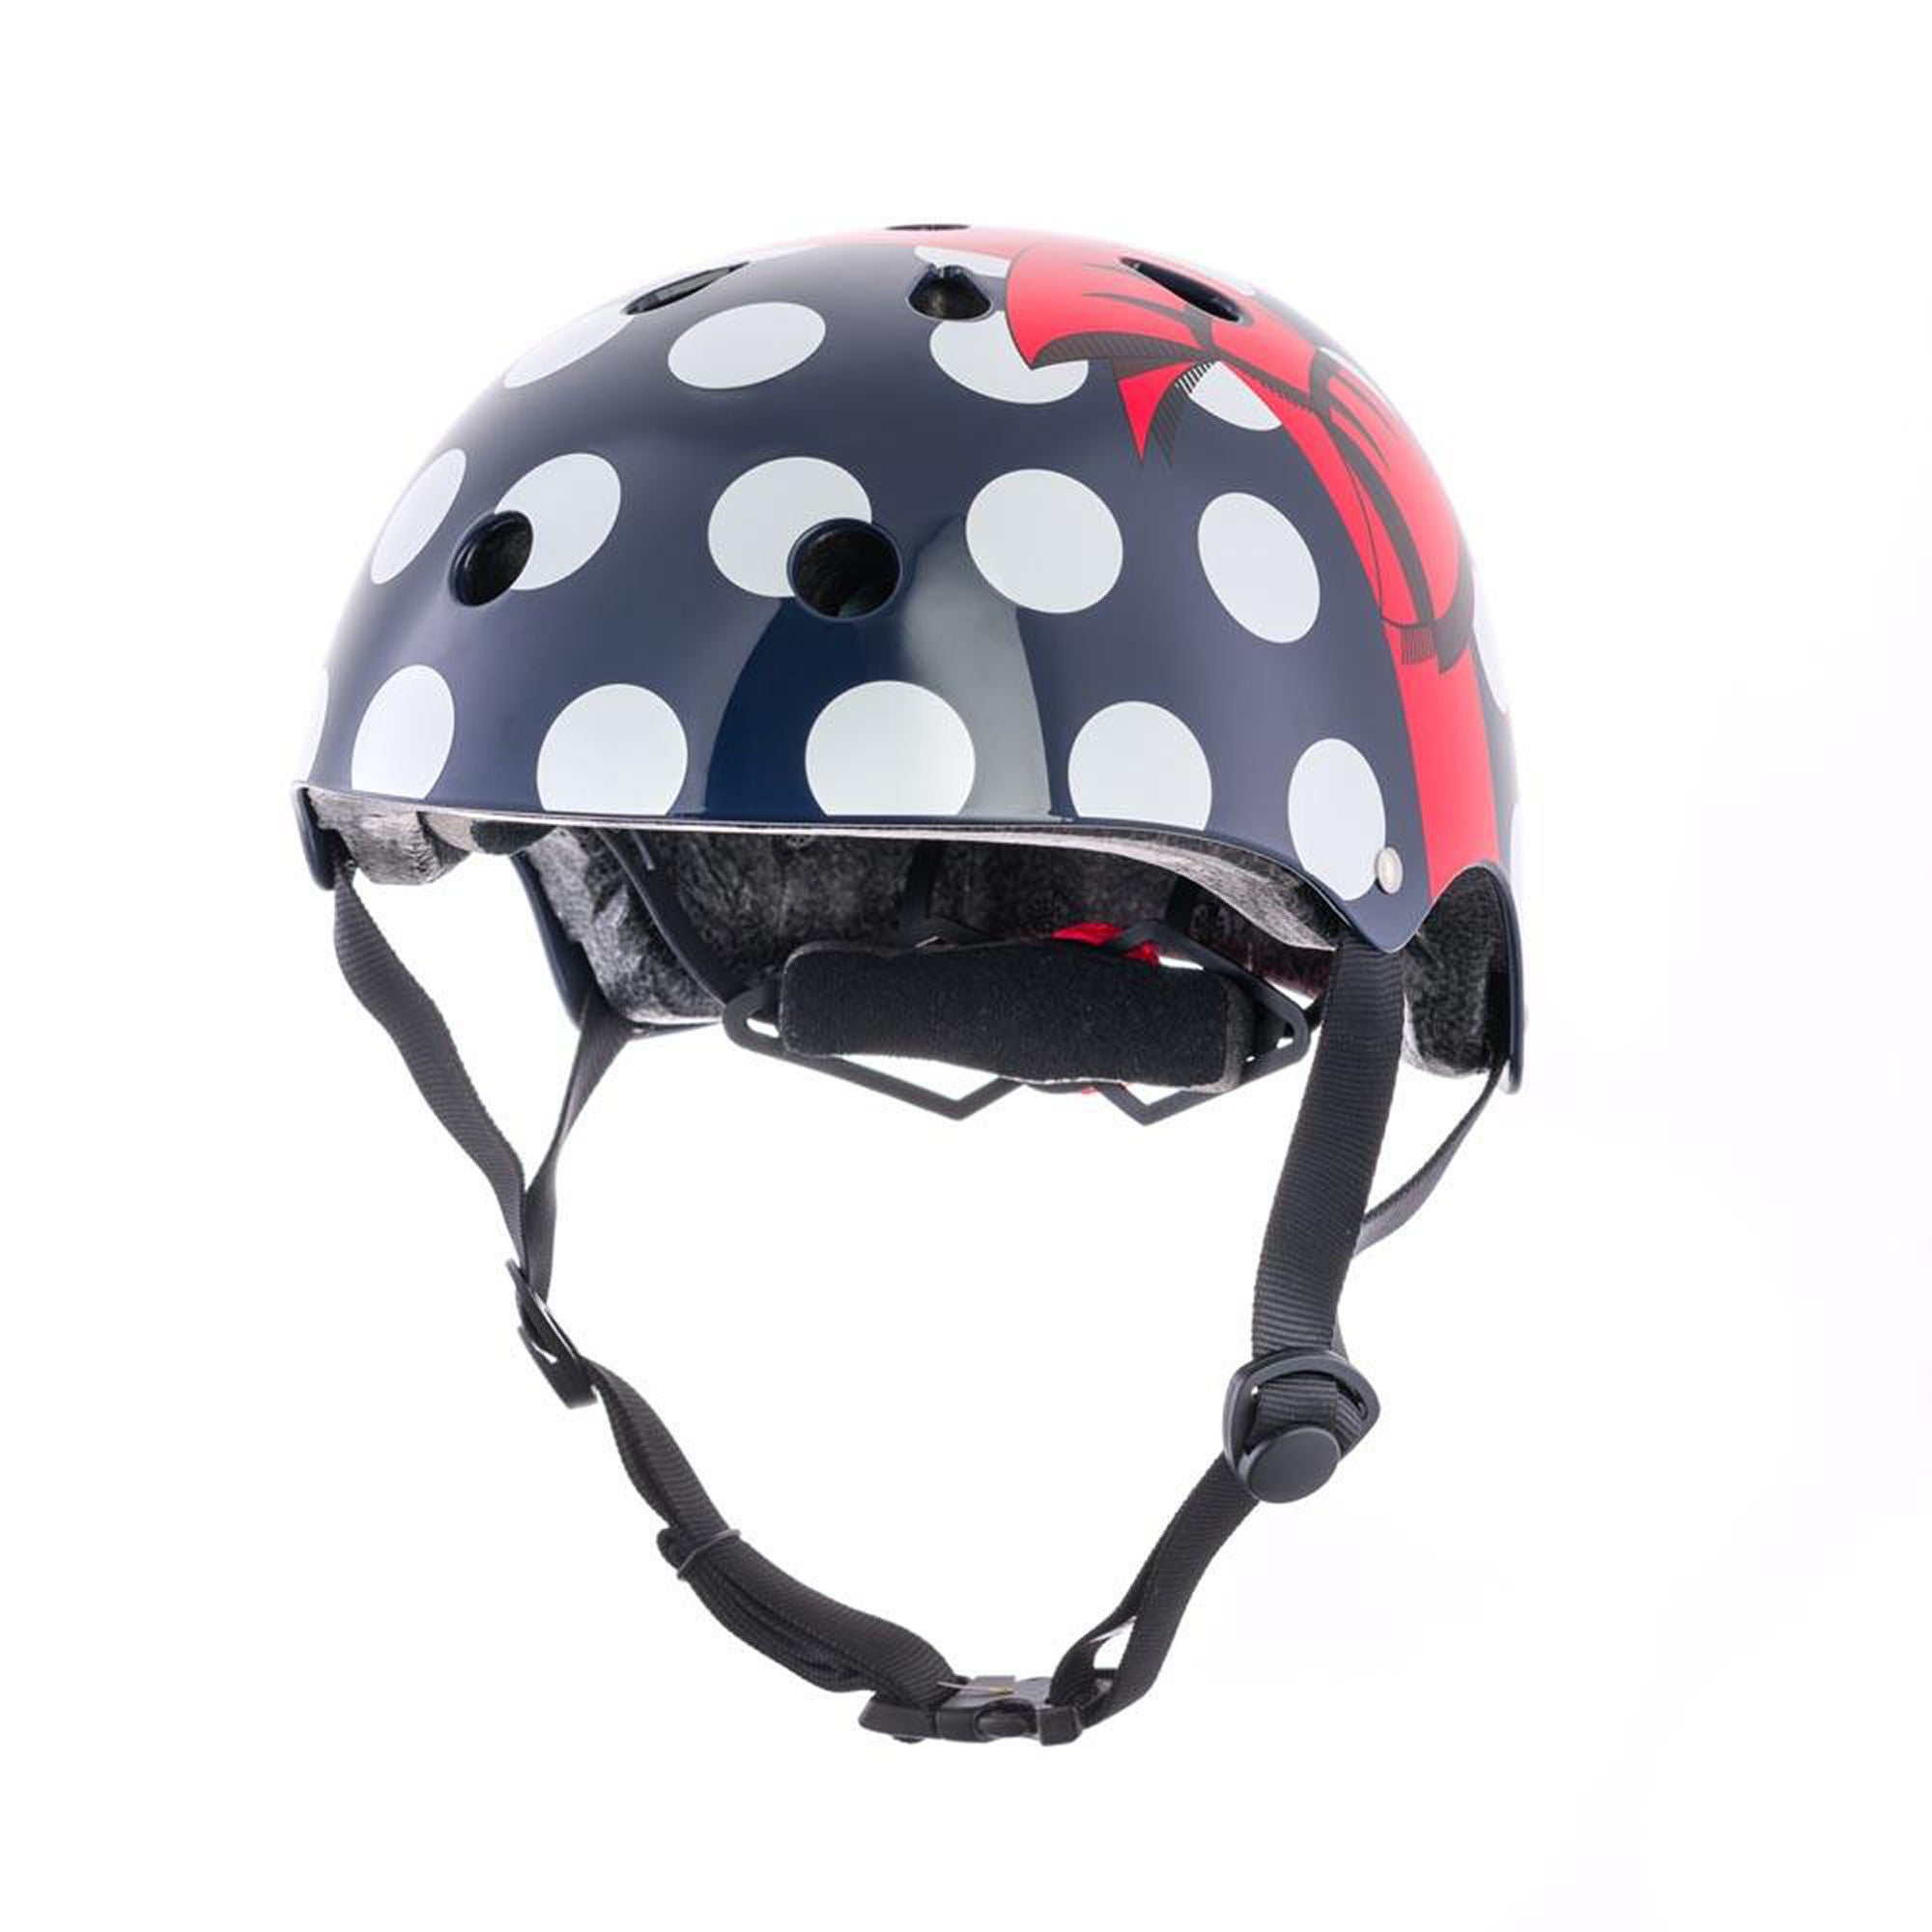 Hornit Polka Dot Cykelhjälm 48-53 Cm, Blå